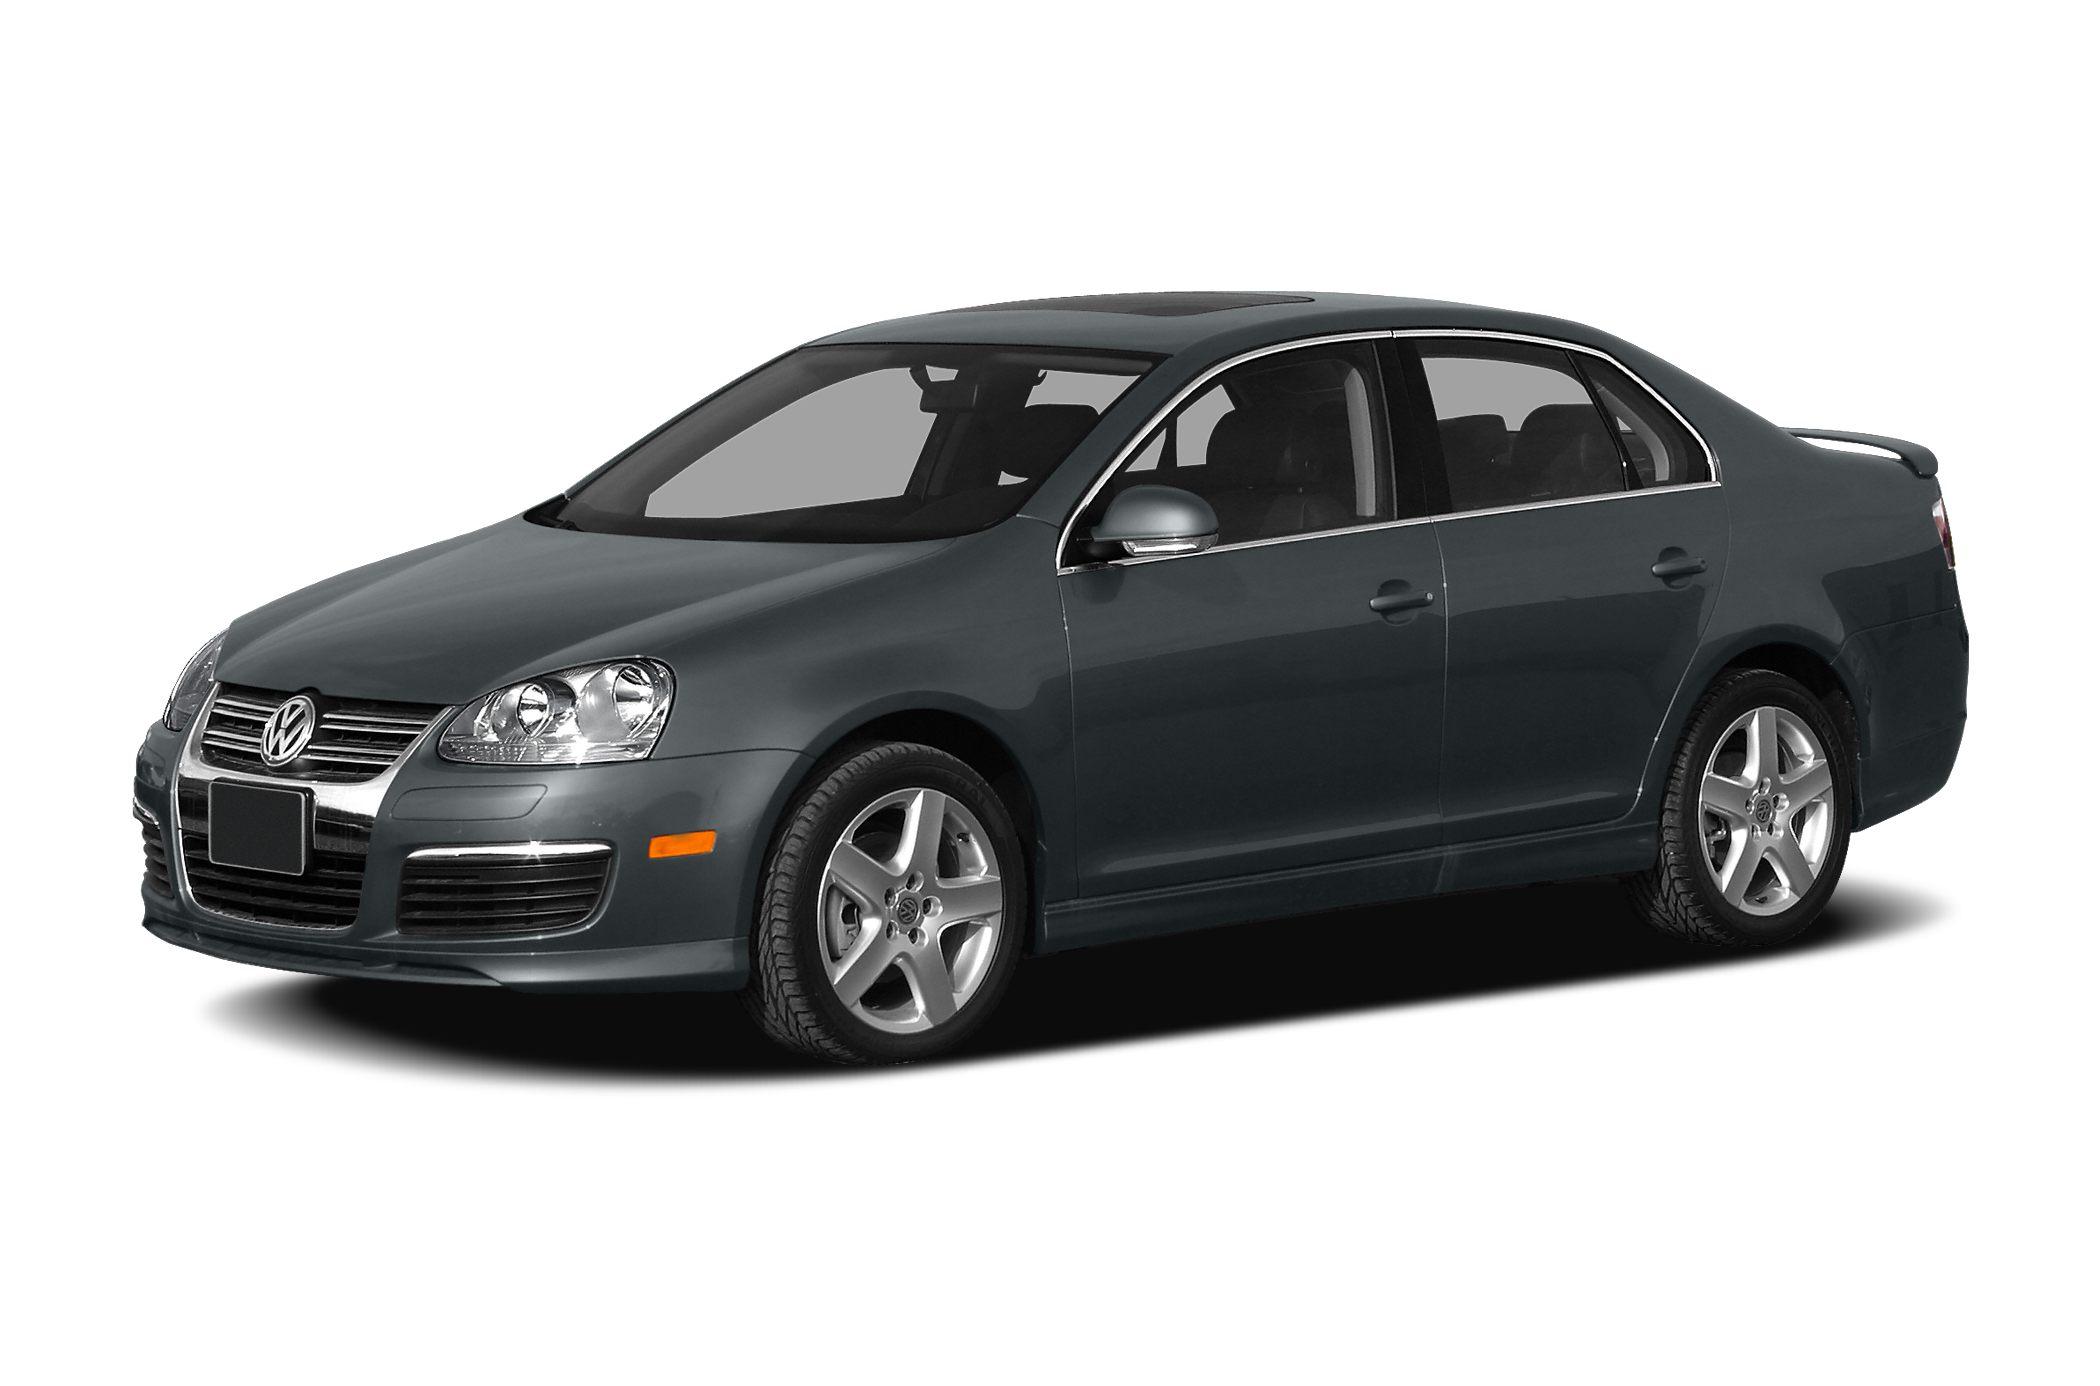 2009 Volkswagen Jetta TDI Sedan for sale in Greeley for $11,999 with 140,136 miles.